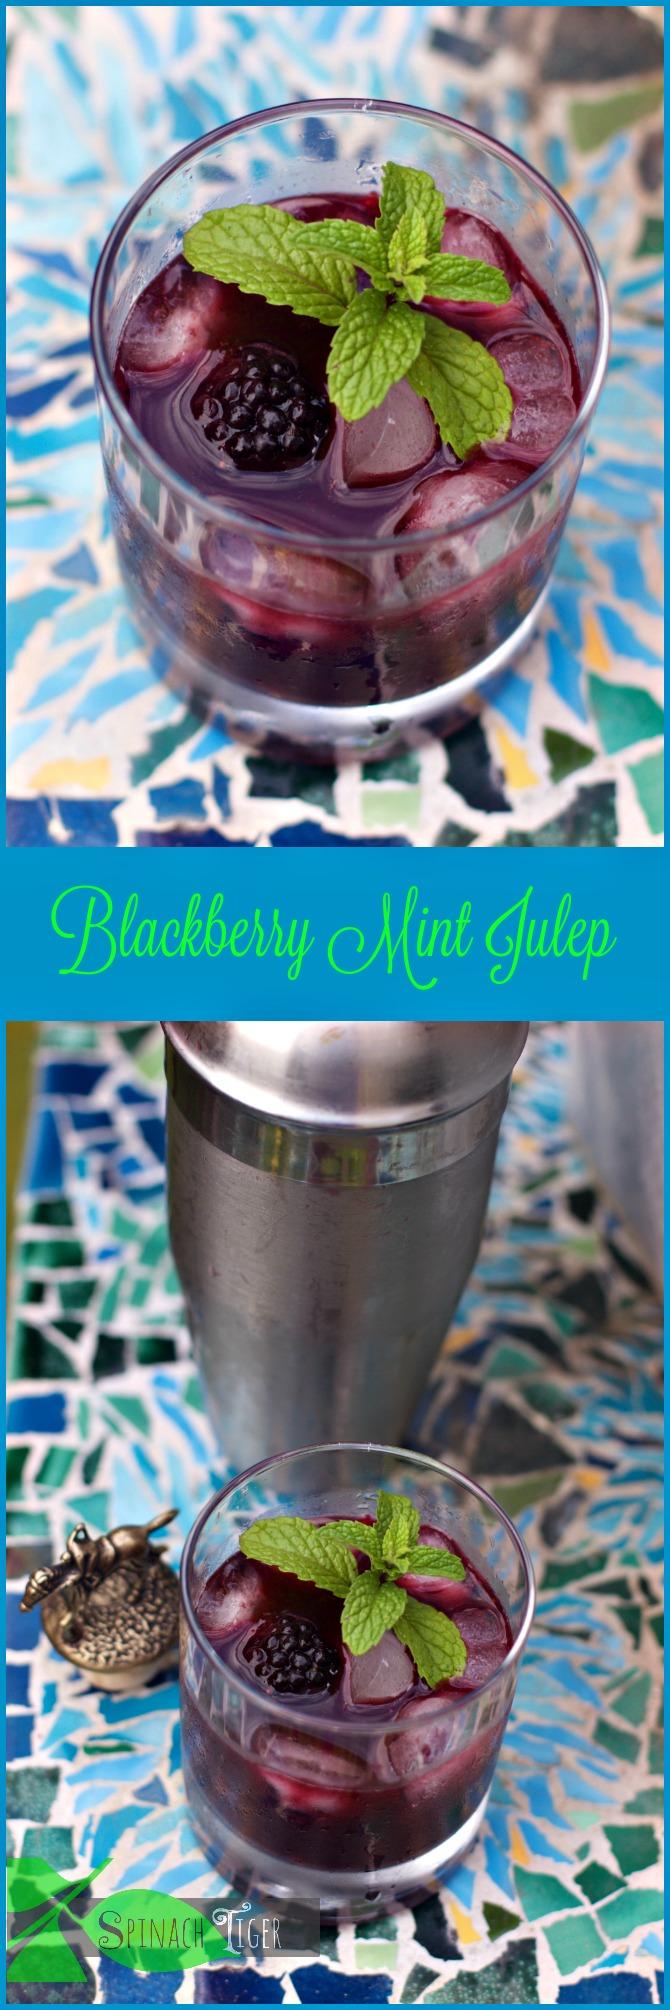 Blackberry Mint Julep by Angela Roberts